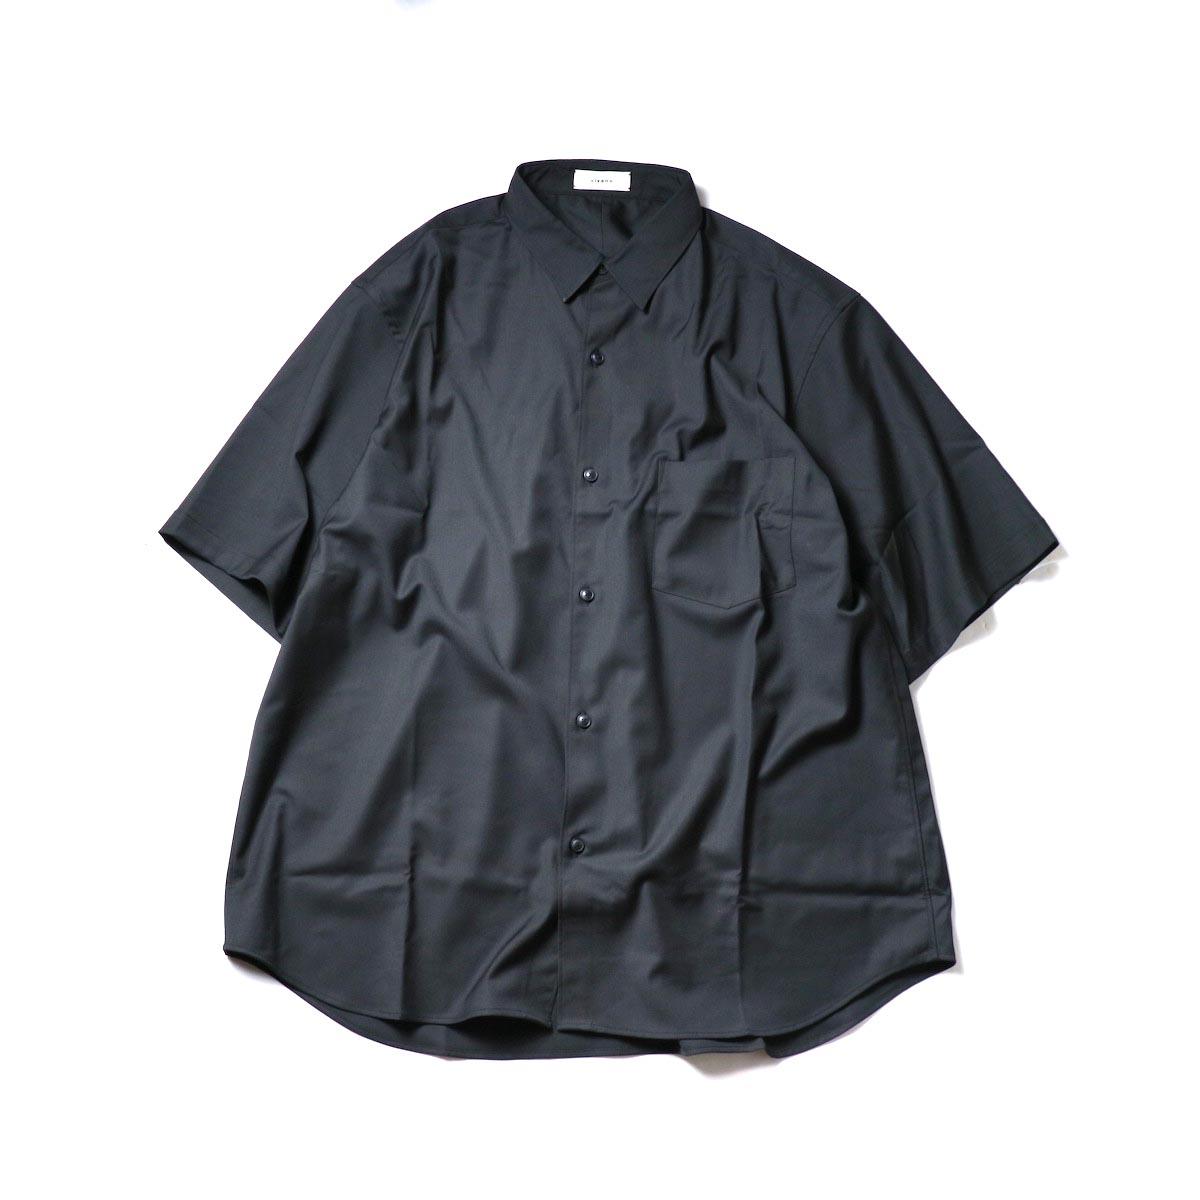 alvana / Wrinkle Proof Shirts (Black)